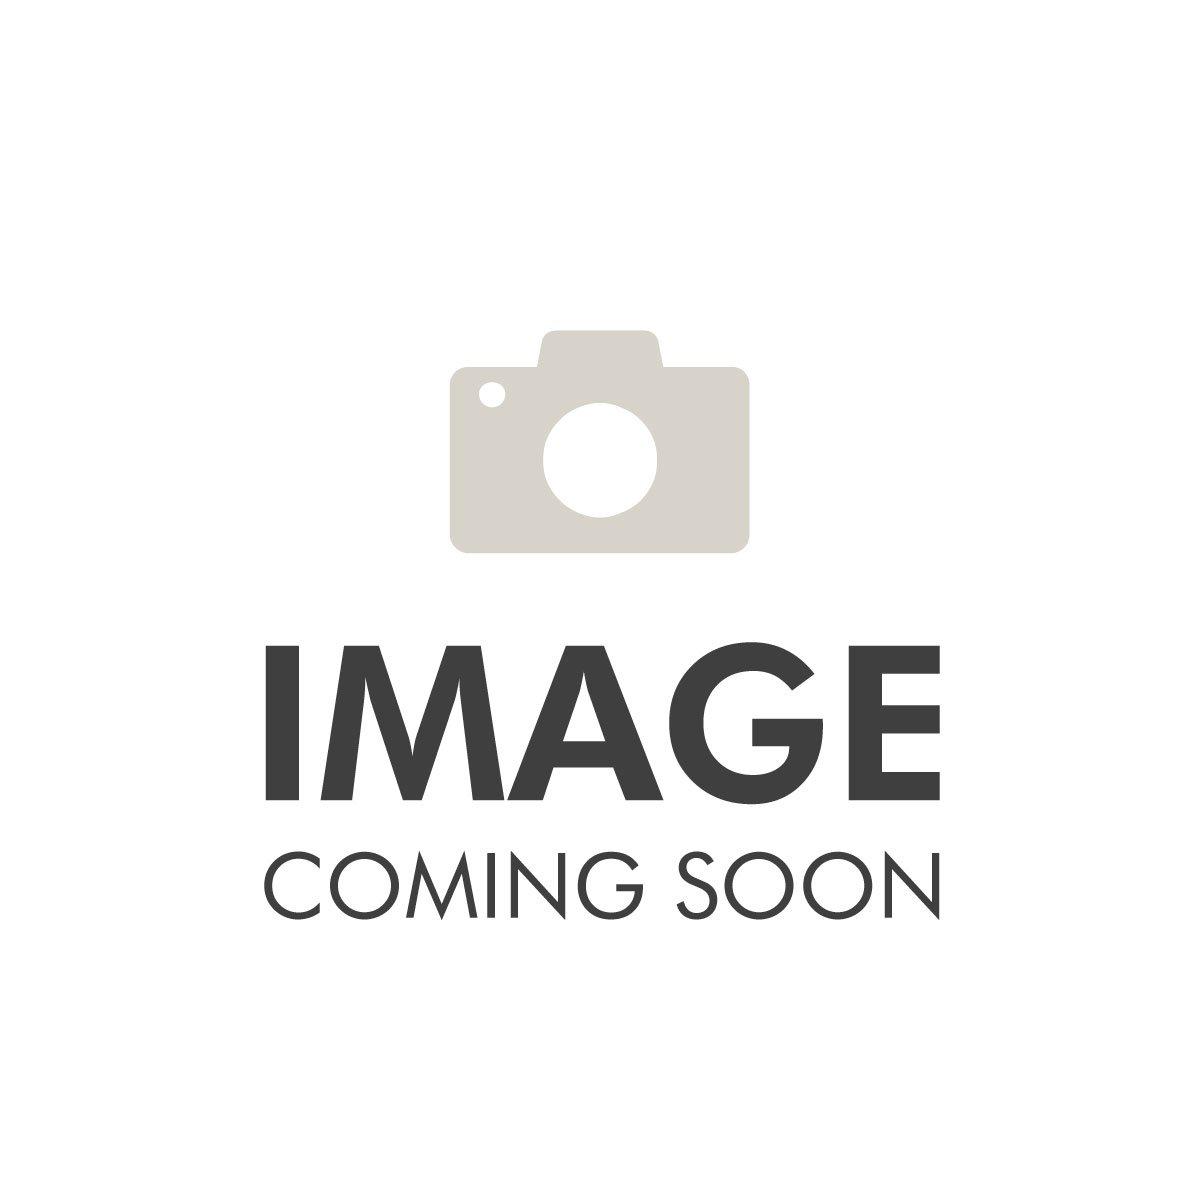 L'Oreal Loreal Accord Parfait Liquid Foundation 5R Sable Rosé 30ml